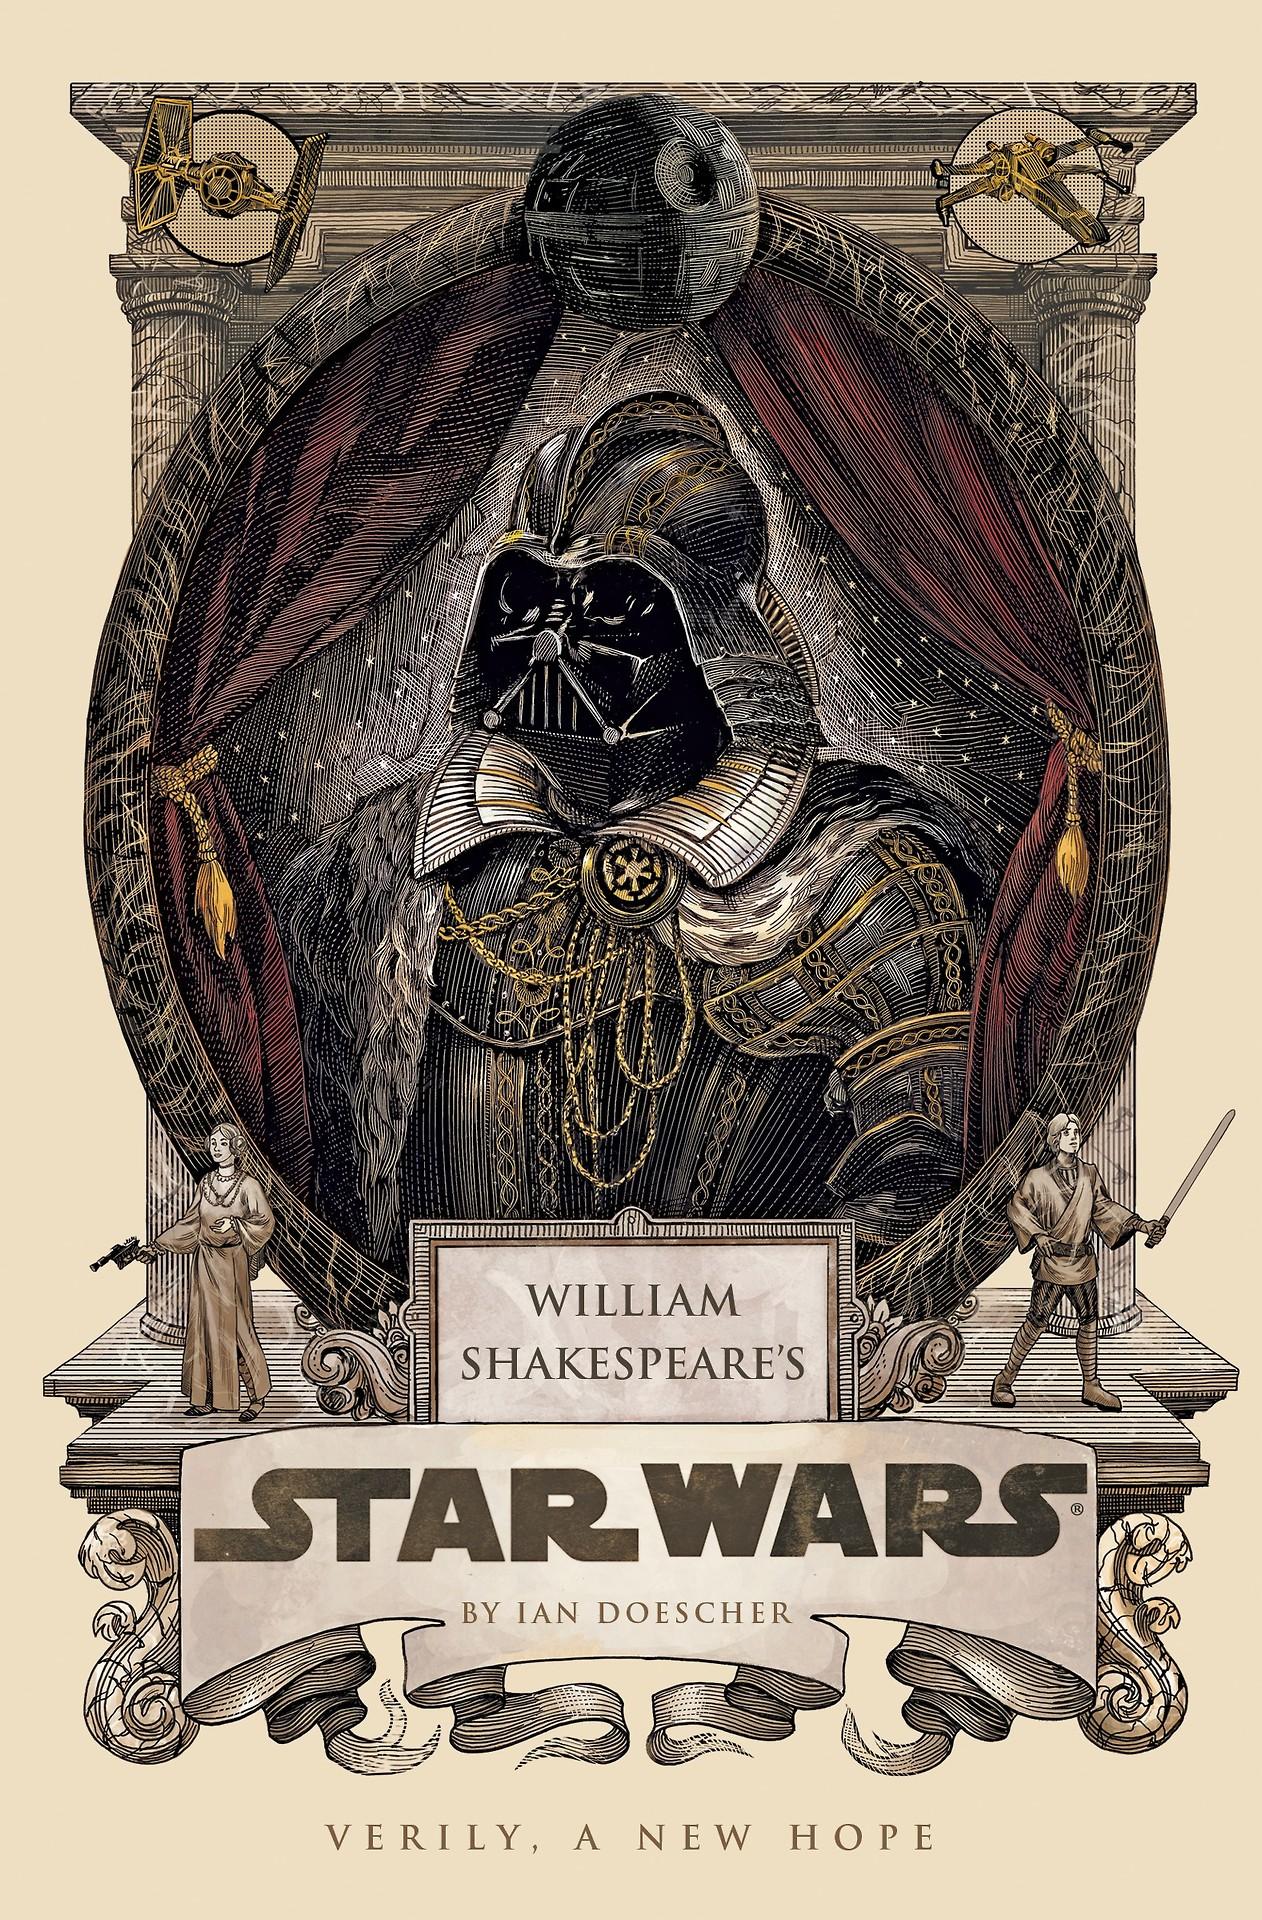 Nicolas-Delort-William-Shakespeare's-Star-Wars2